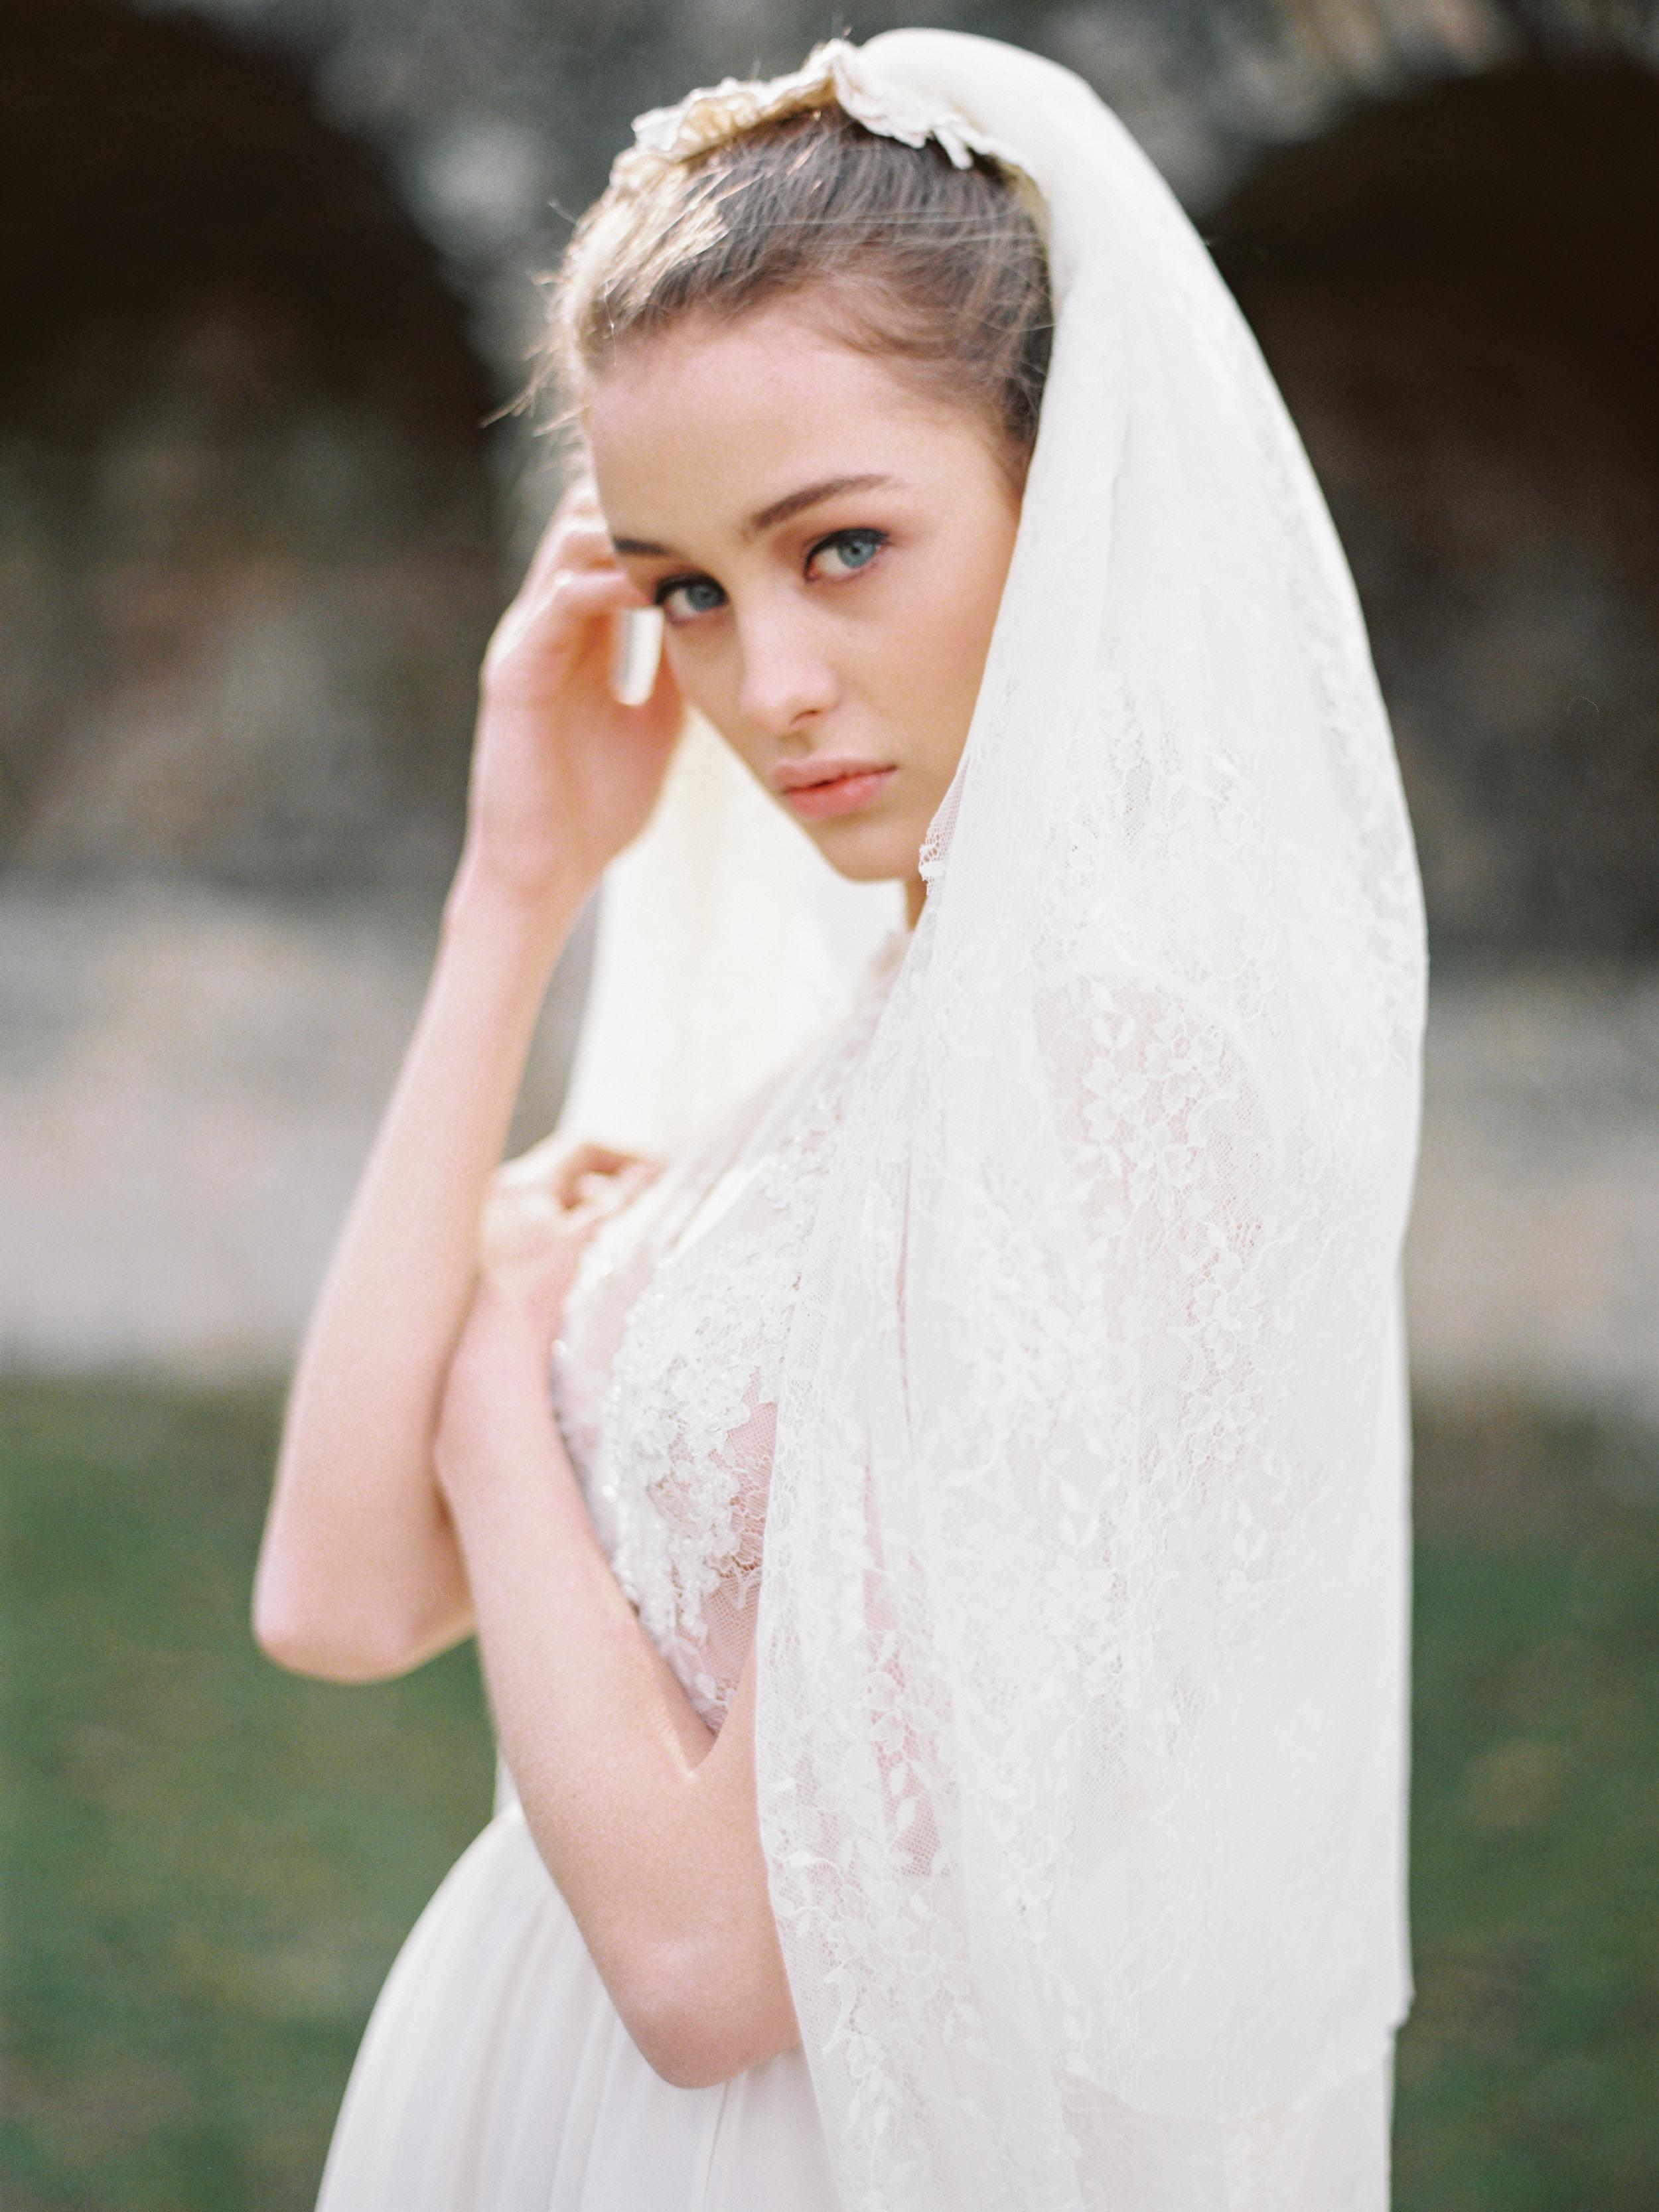 TamaraGigolaphotography,Cathytelle,royalweddingdress,kakheti-0044-5.JPG